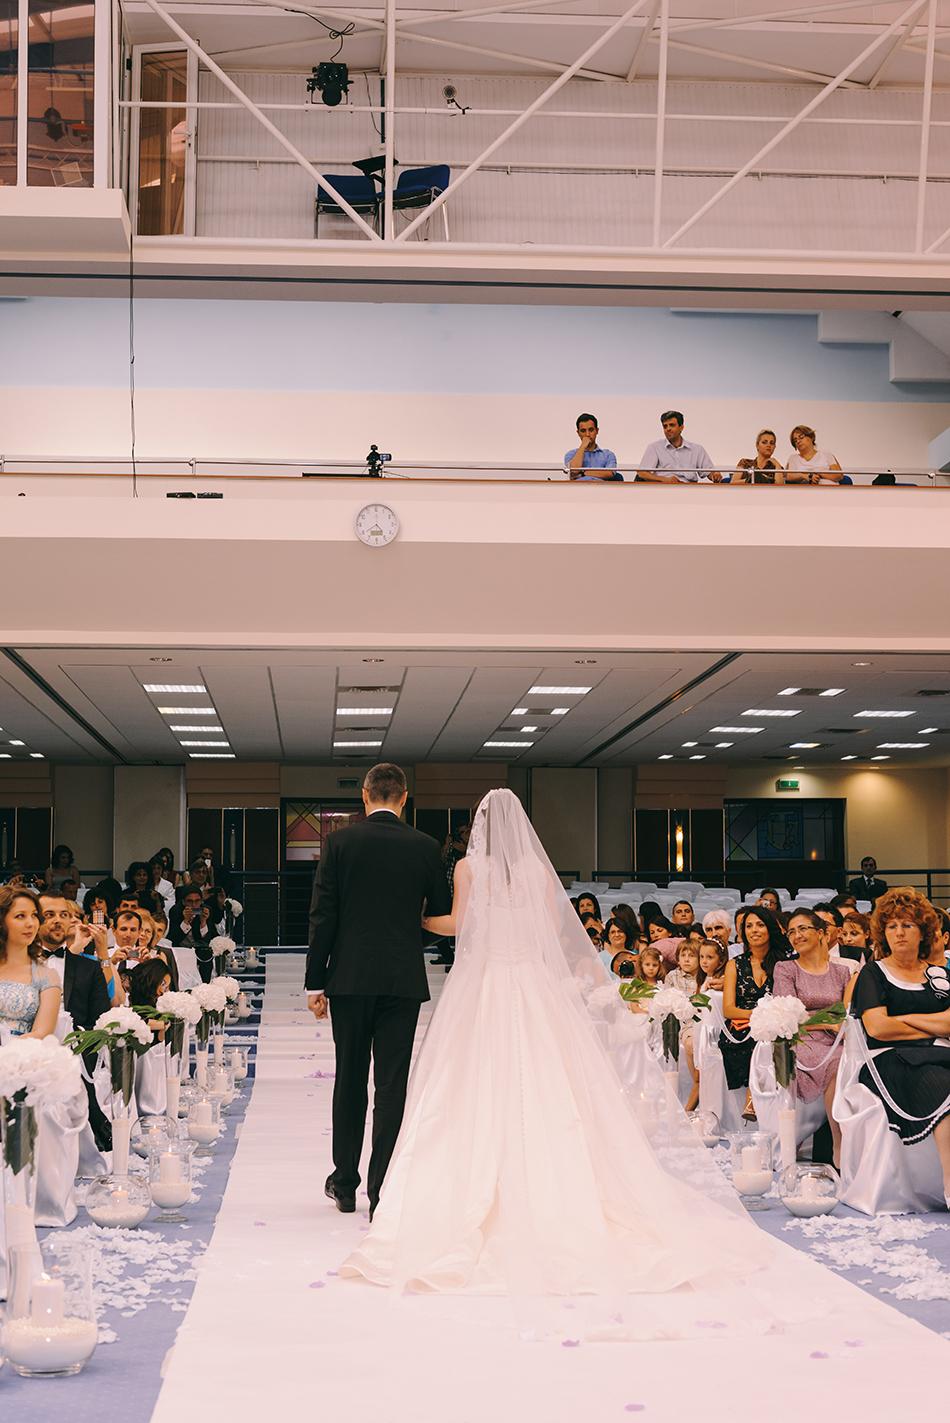 AD Passion Photography | astrid-madalin-nunta-rin-grand-hotel-bucuresti-fotograf-profesionist_0148 | Adelin, Dida, fotograf profesionist, fotograf de nunta, fotografie de nunta, fotograf Timisoara, fotograf Craiova, fotograf Bucuresti, fotograf Arad, nunta Timisoara, nunta Arad, nunta Bucuresti, nunta Craiova